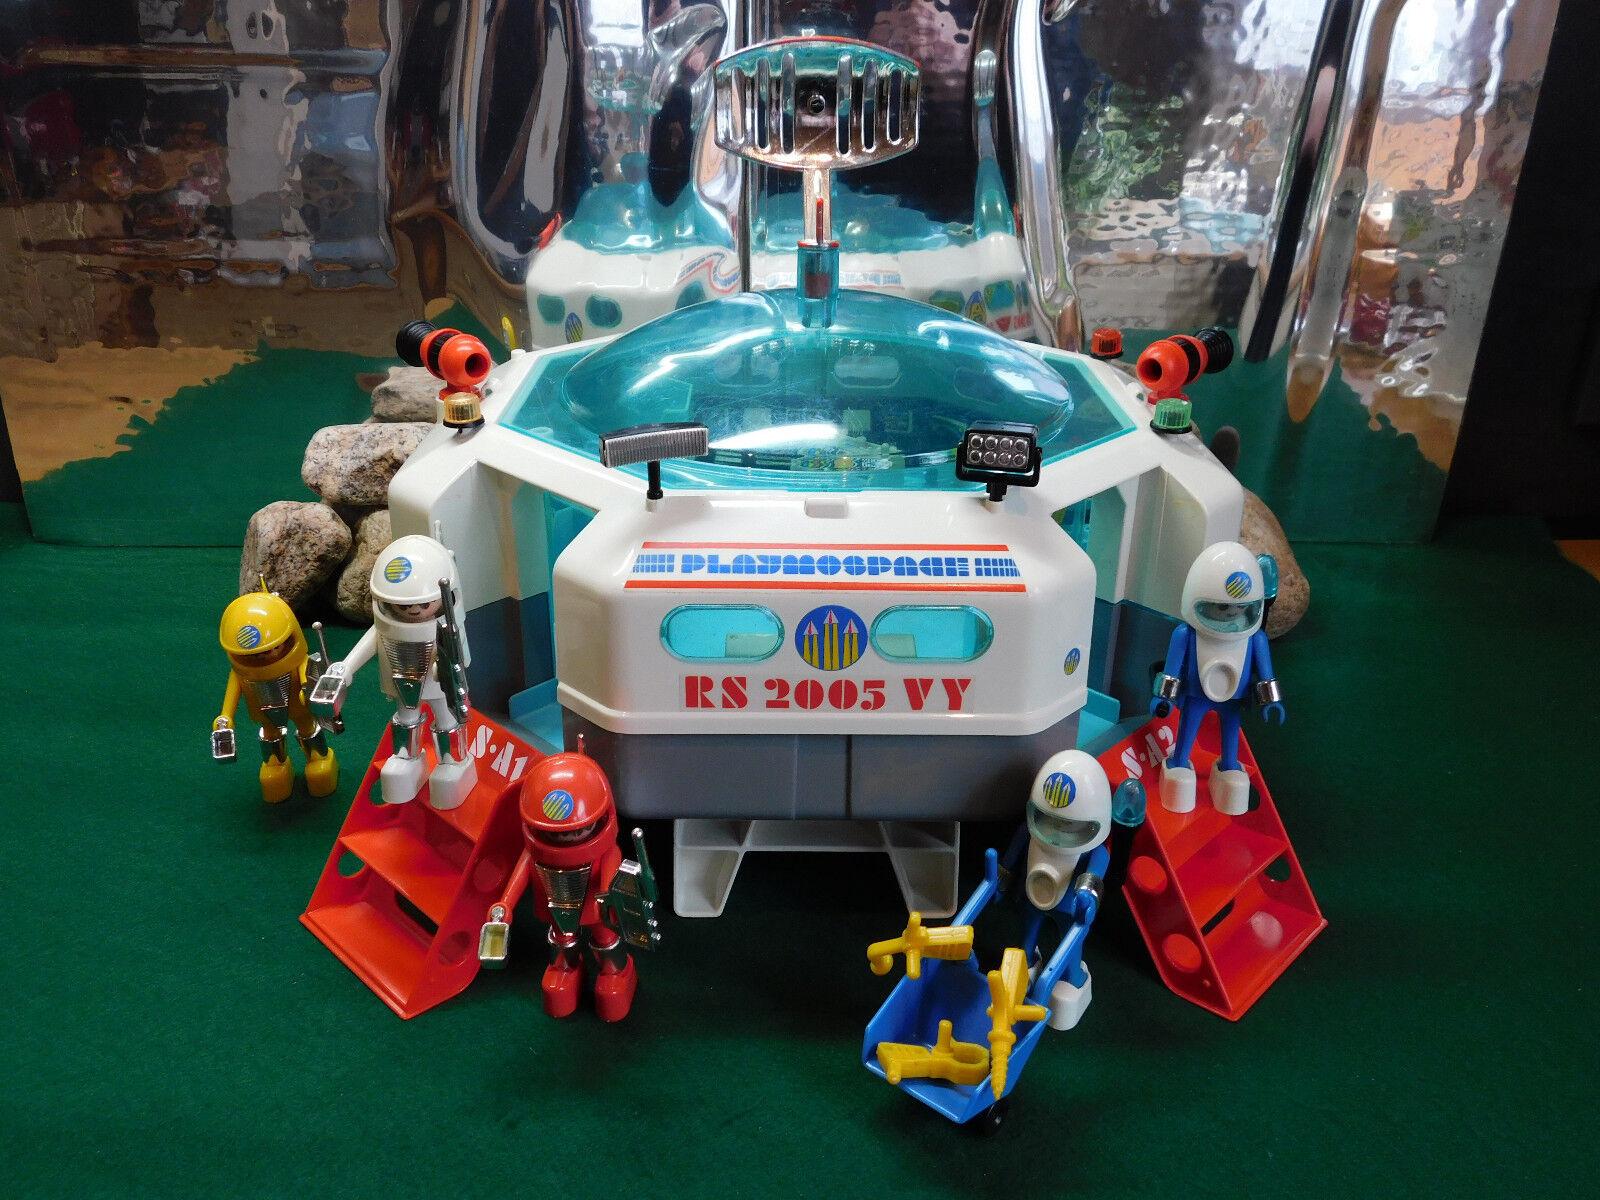 Playmobil Rarität Raumstation 3536-A 1980 ohne OVP